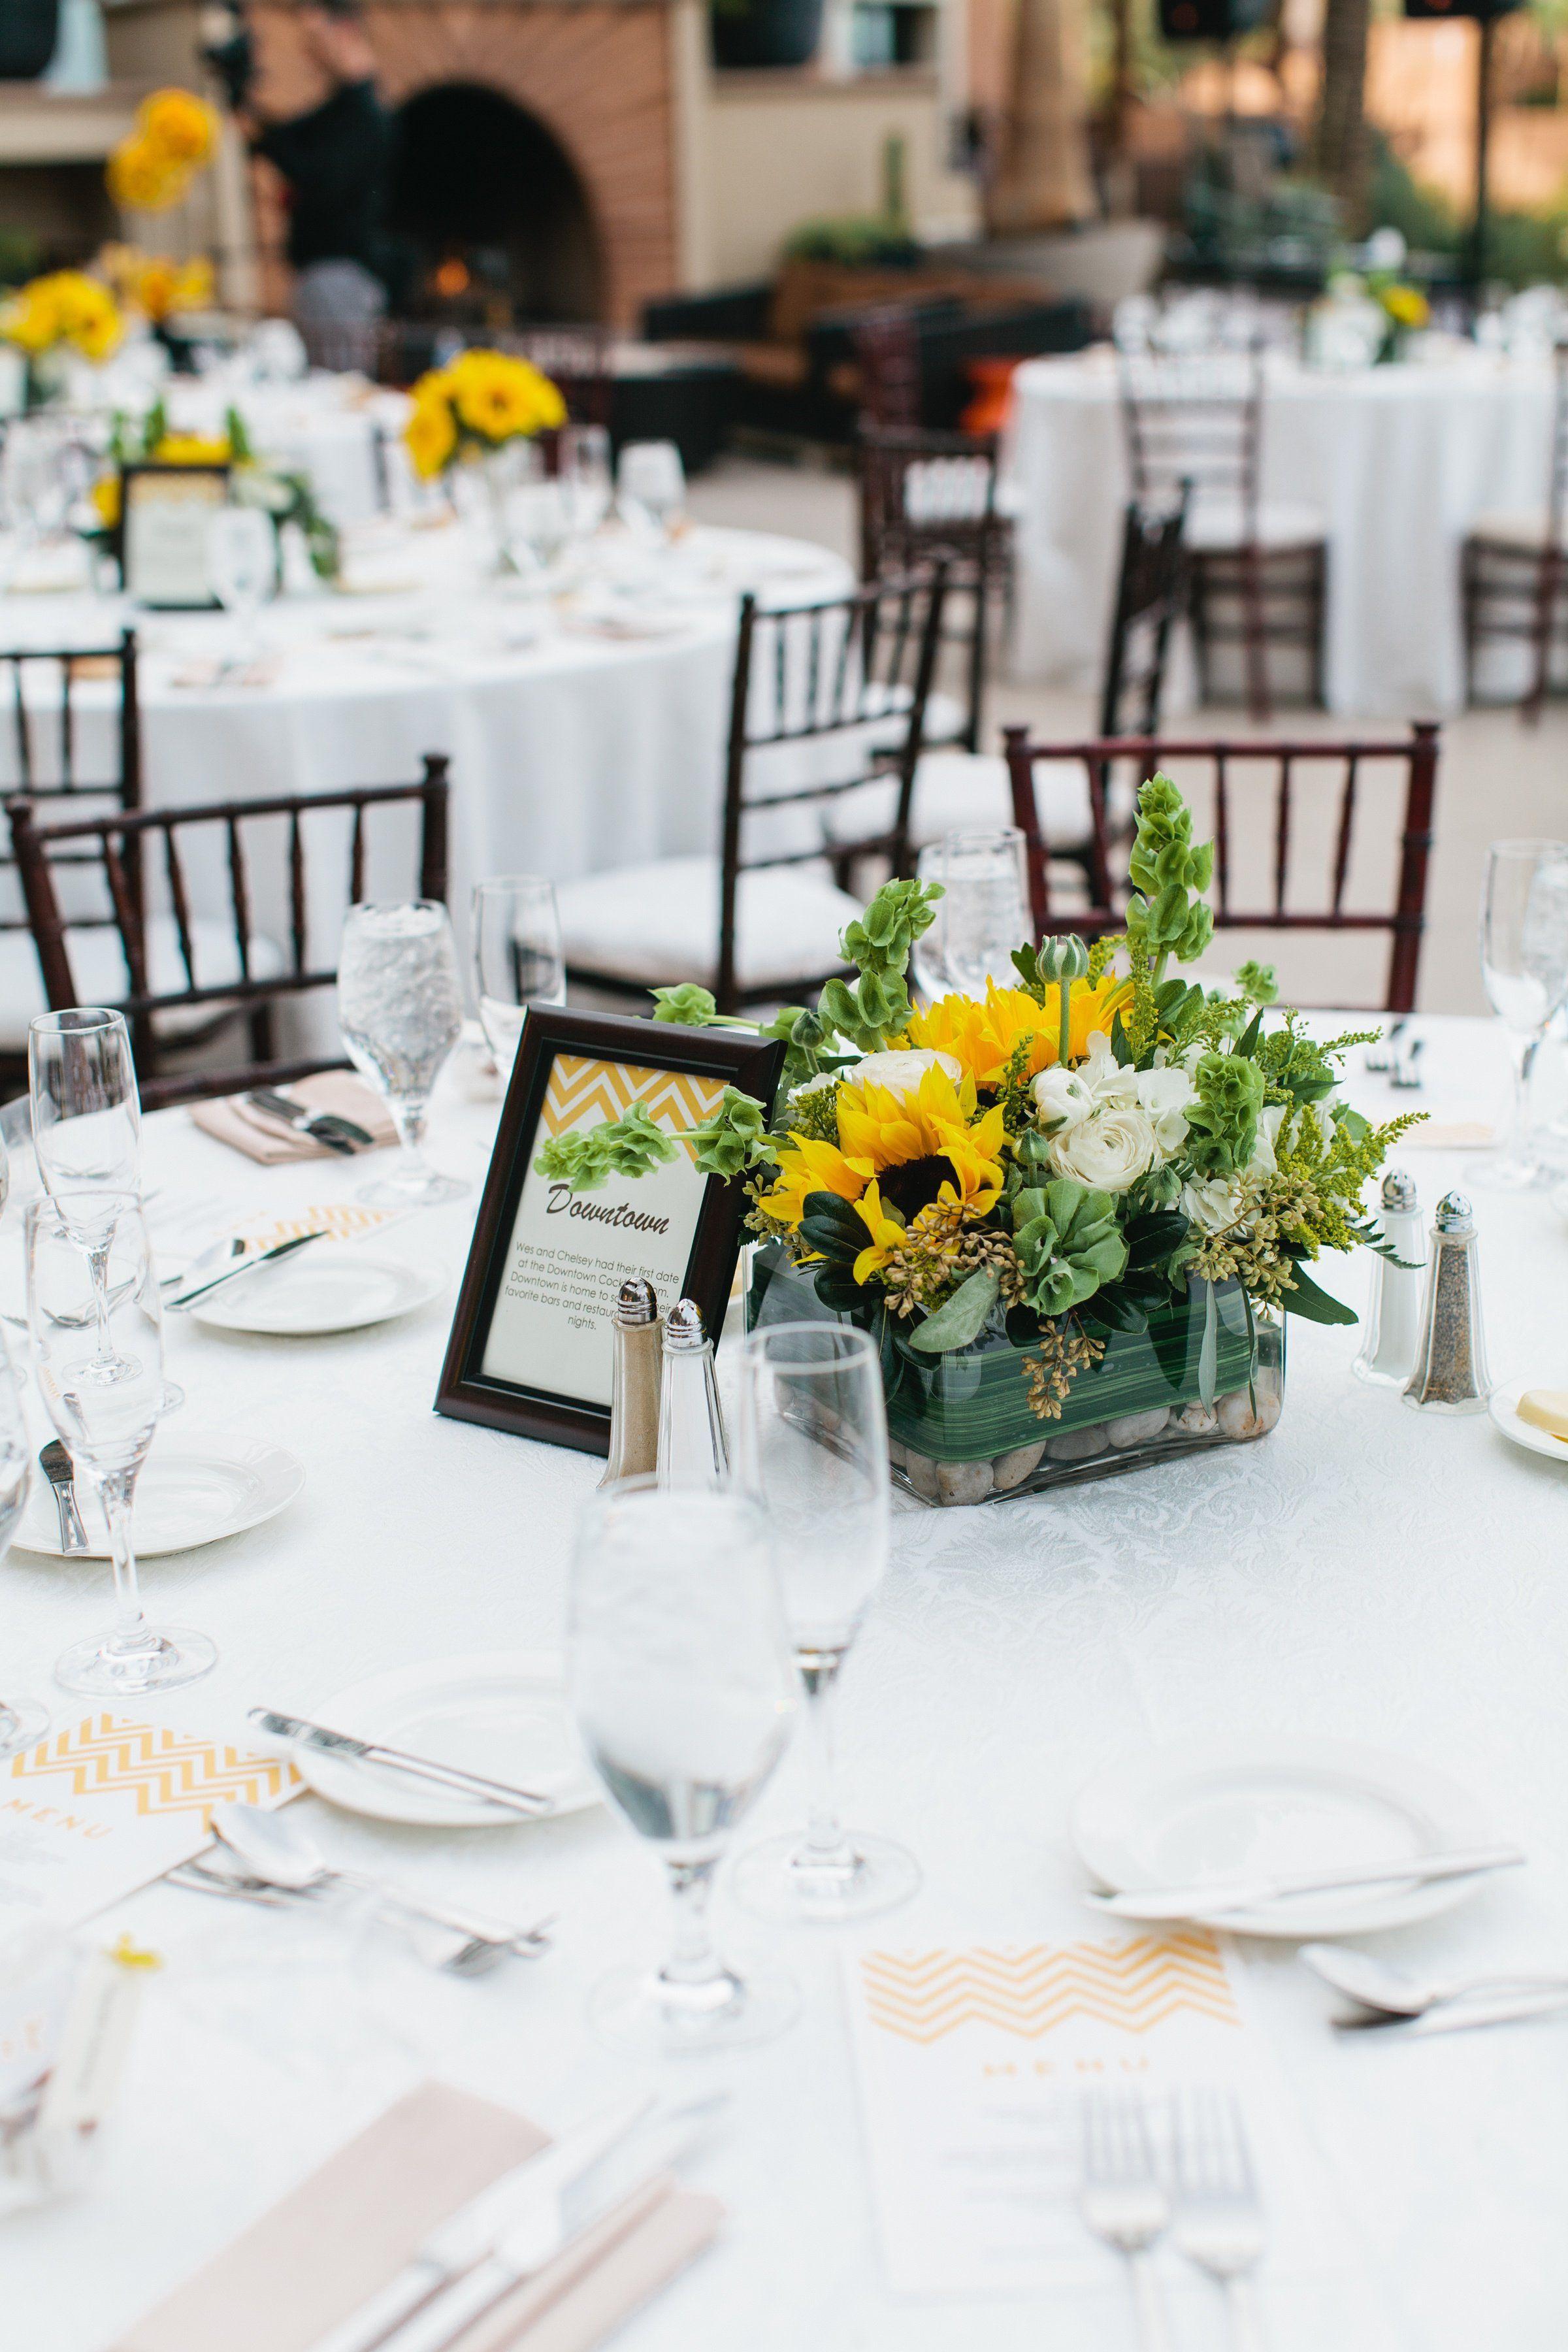 Sophisticated Summer Centerpieces | Wedding Decor | Pinterest ...